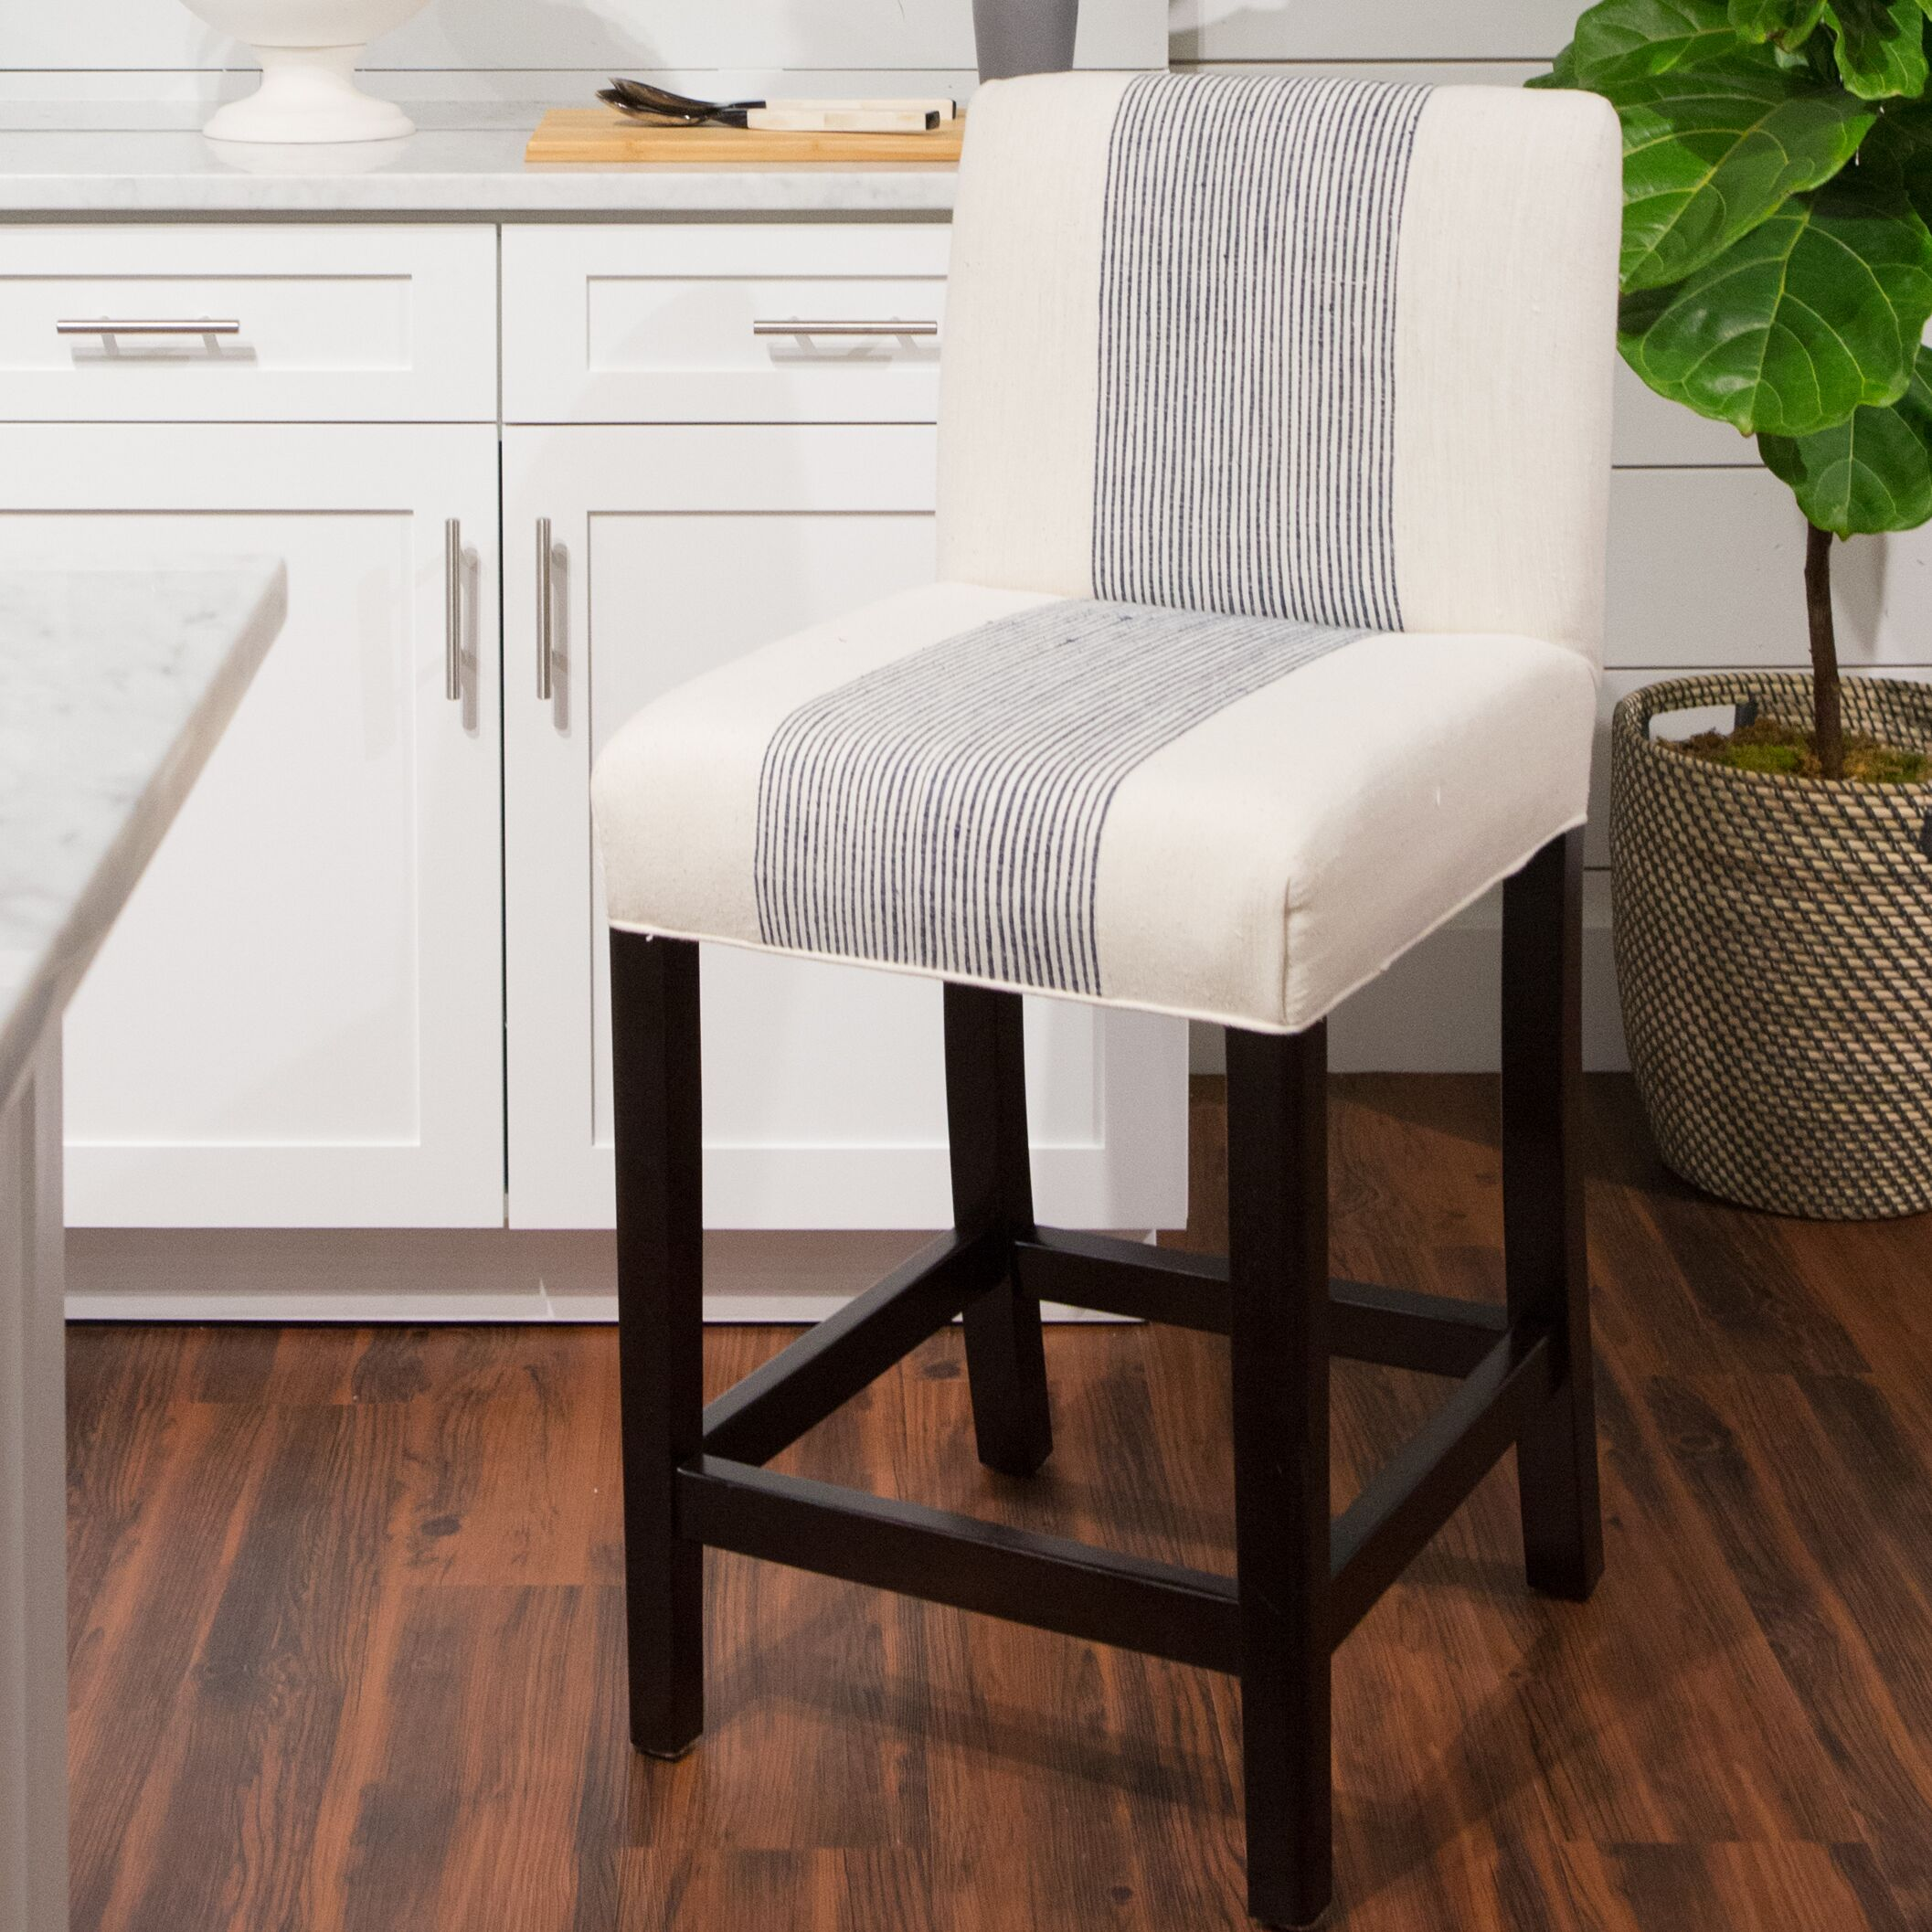 Darby Bar Stool Upholstery: Cobalt/ Natural Stripe